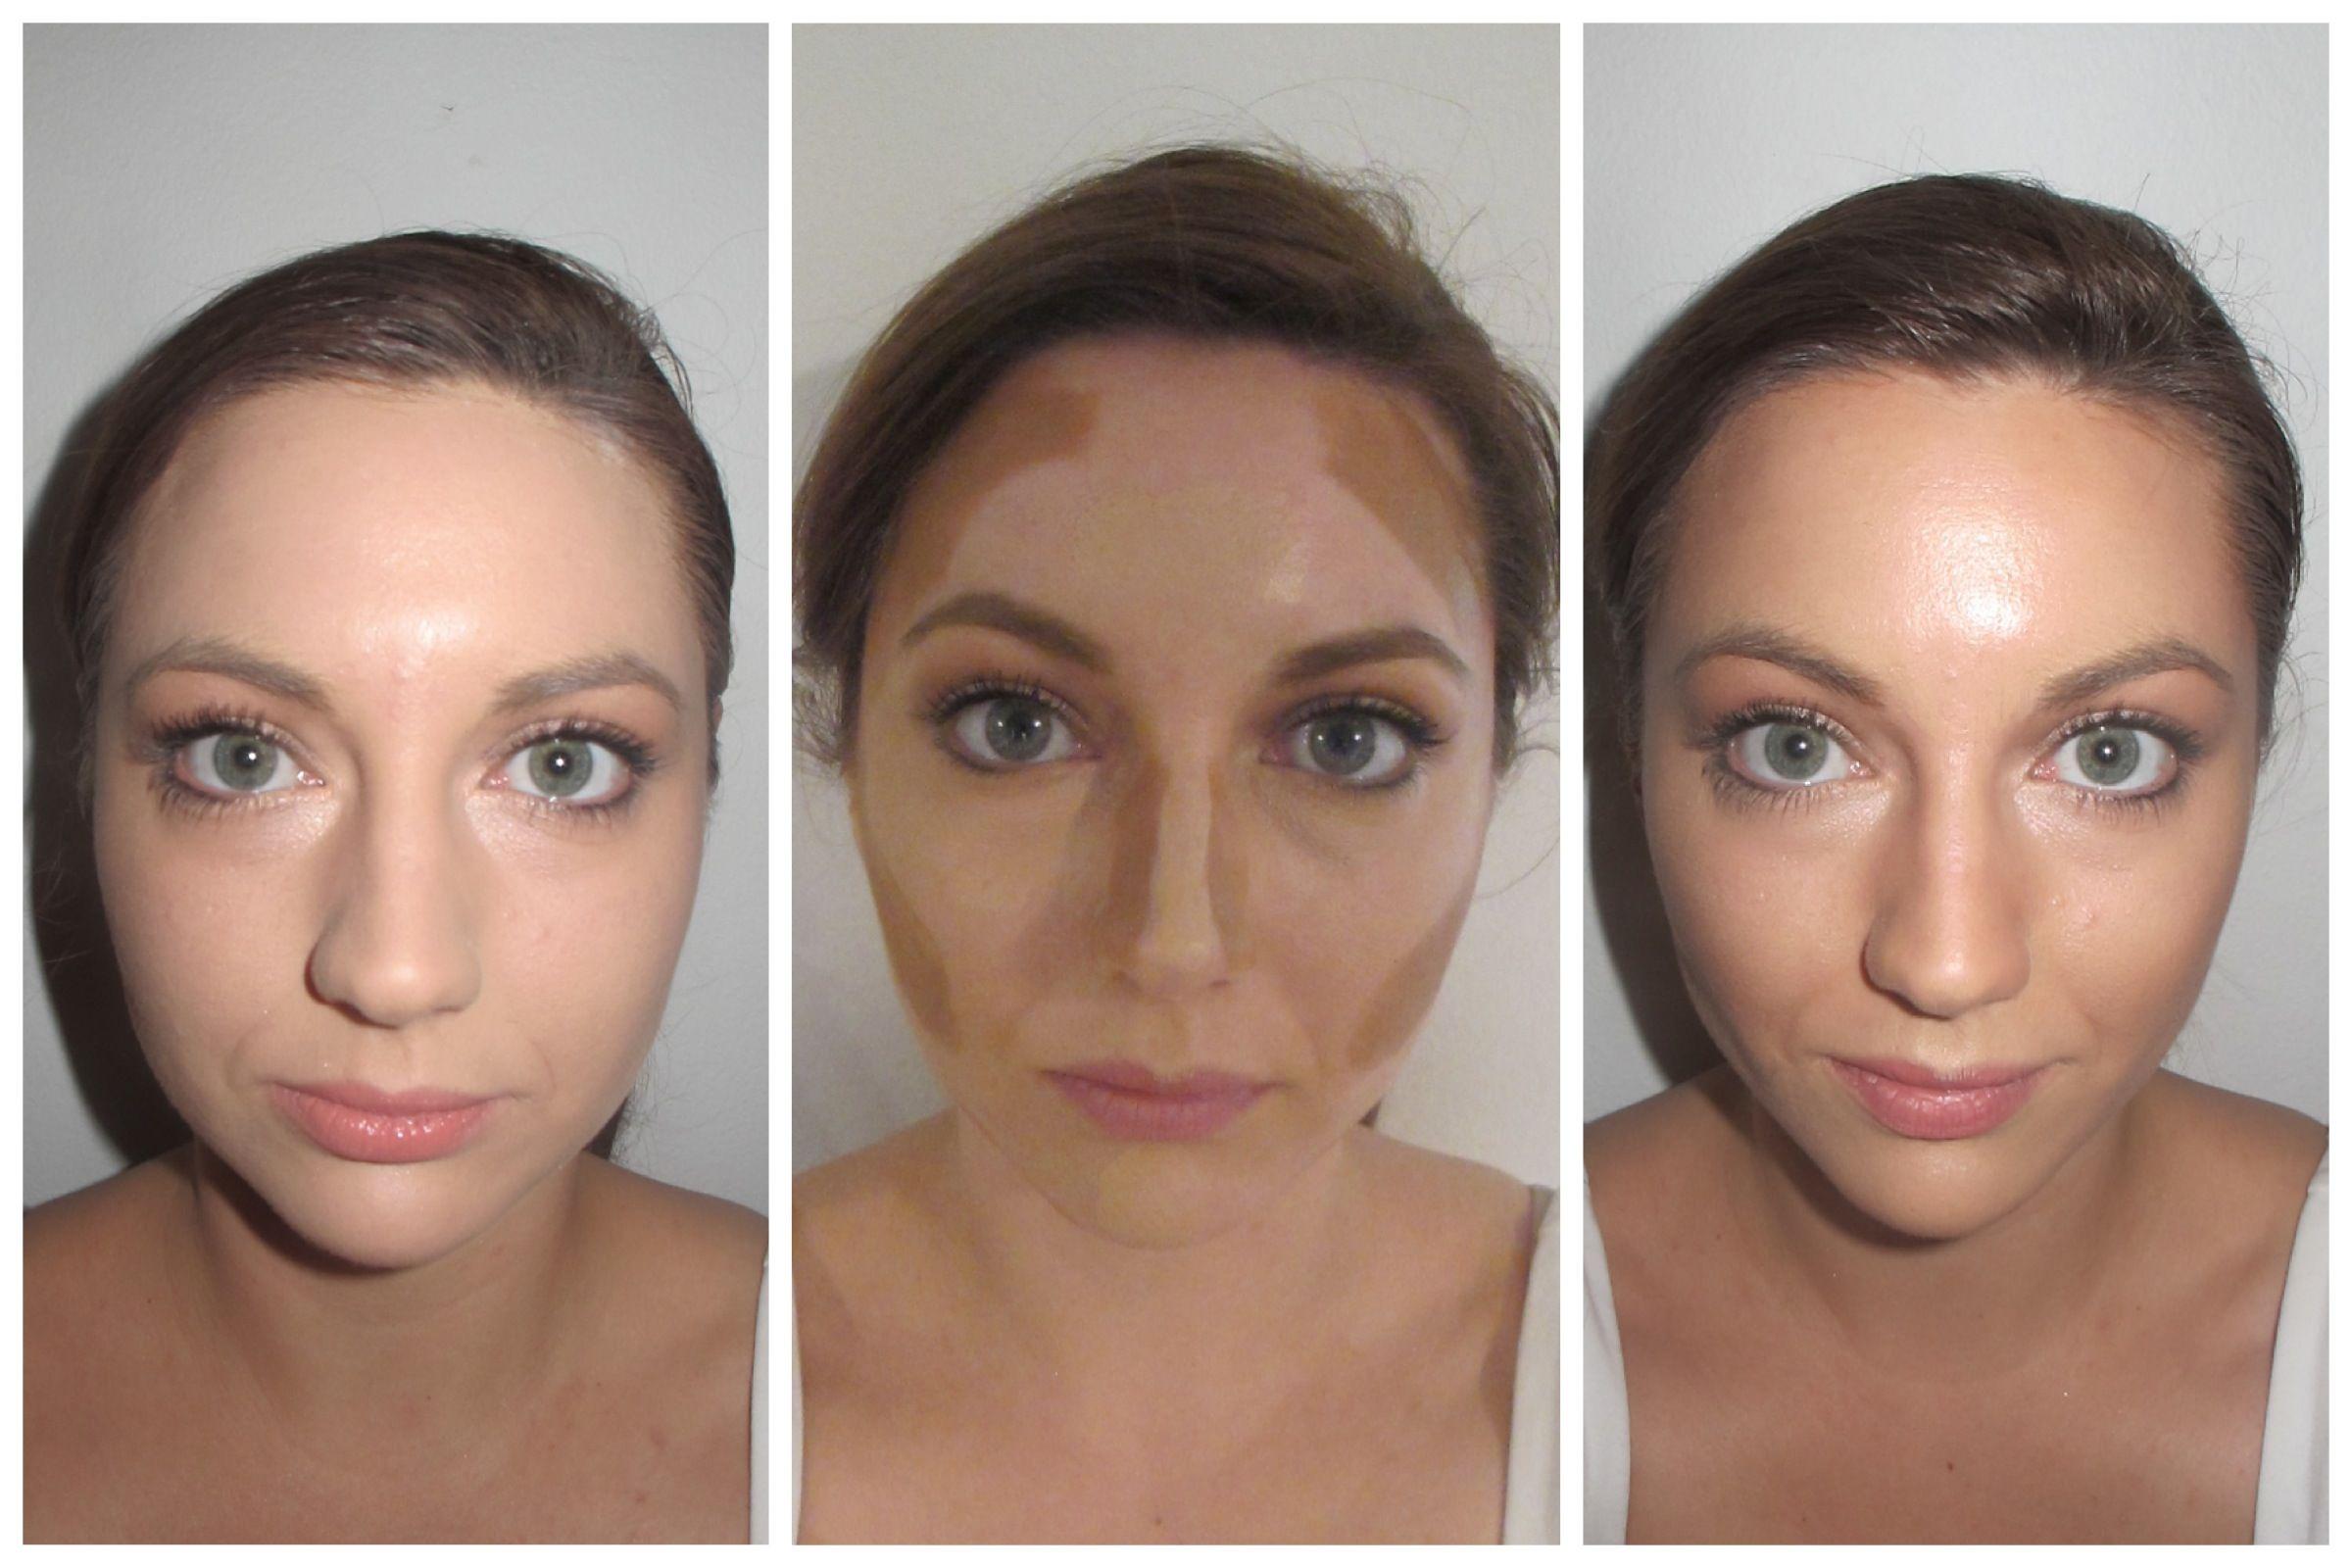 Contouring and Highlighting Create cheekbones like a